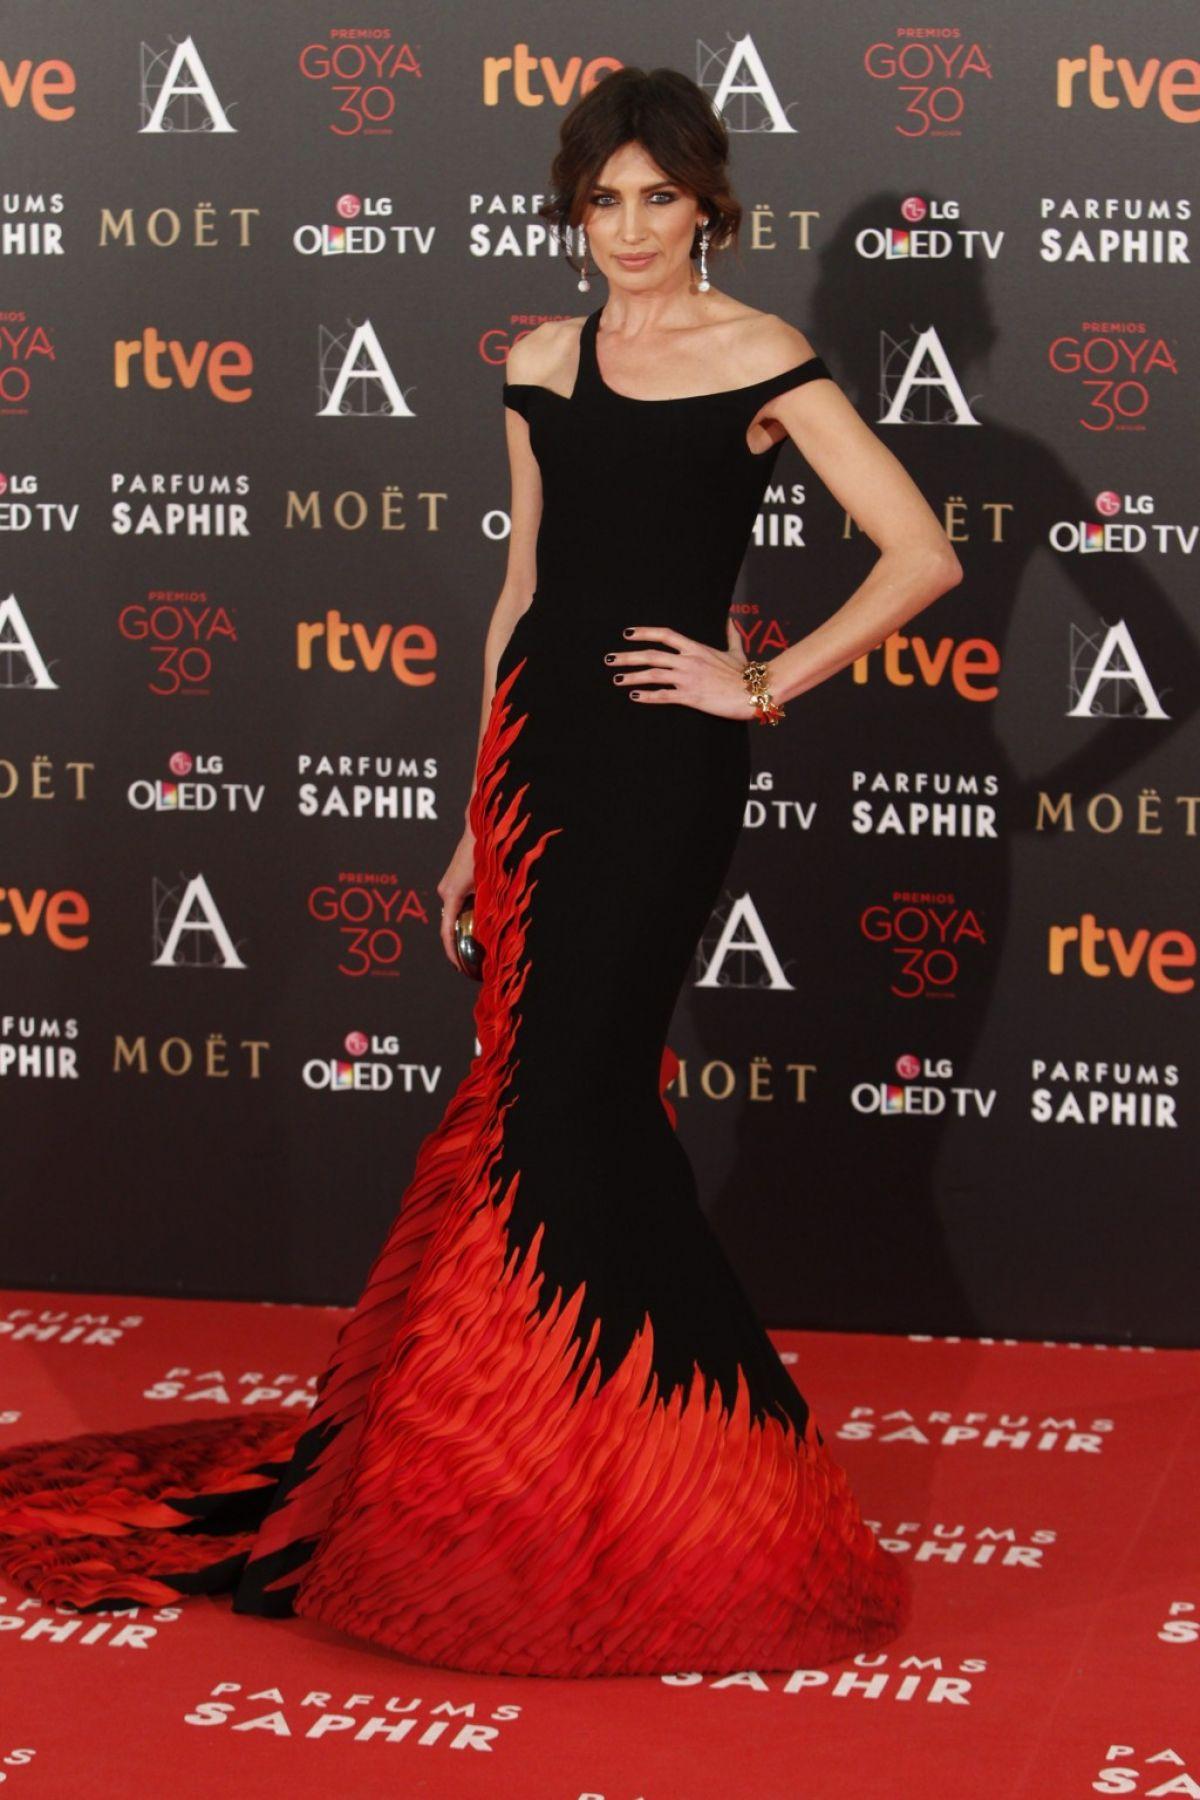 Nieves alvarez goya cinema awards at the marriott auditorium in madrid naked (54 photos), Paparazzi Celebrity photos